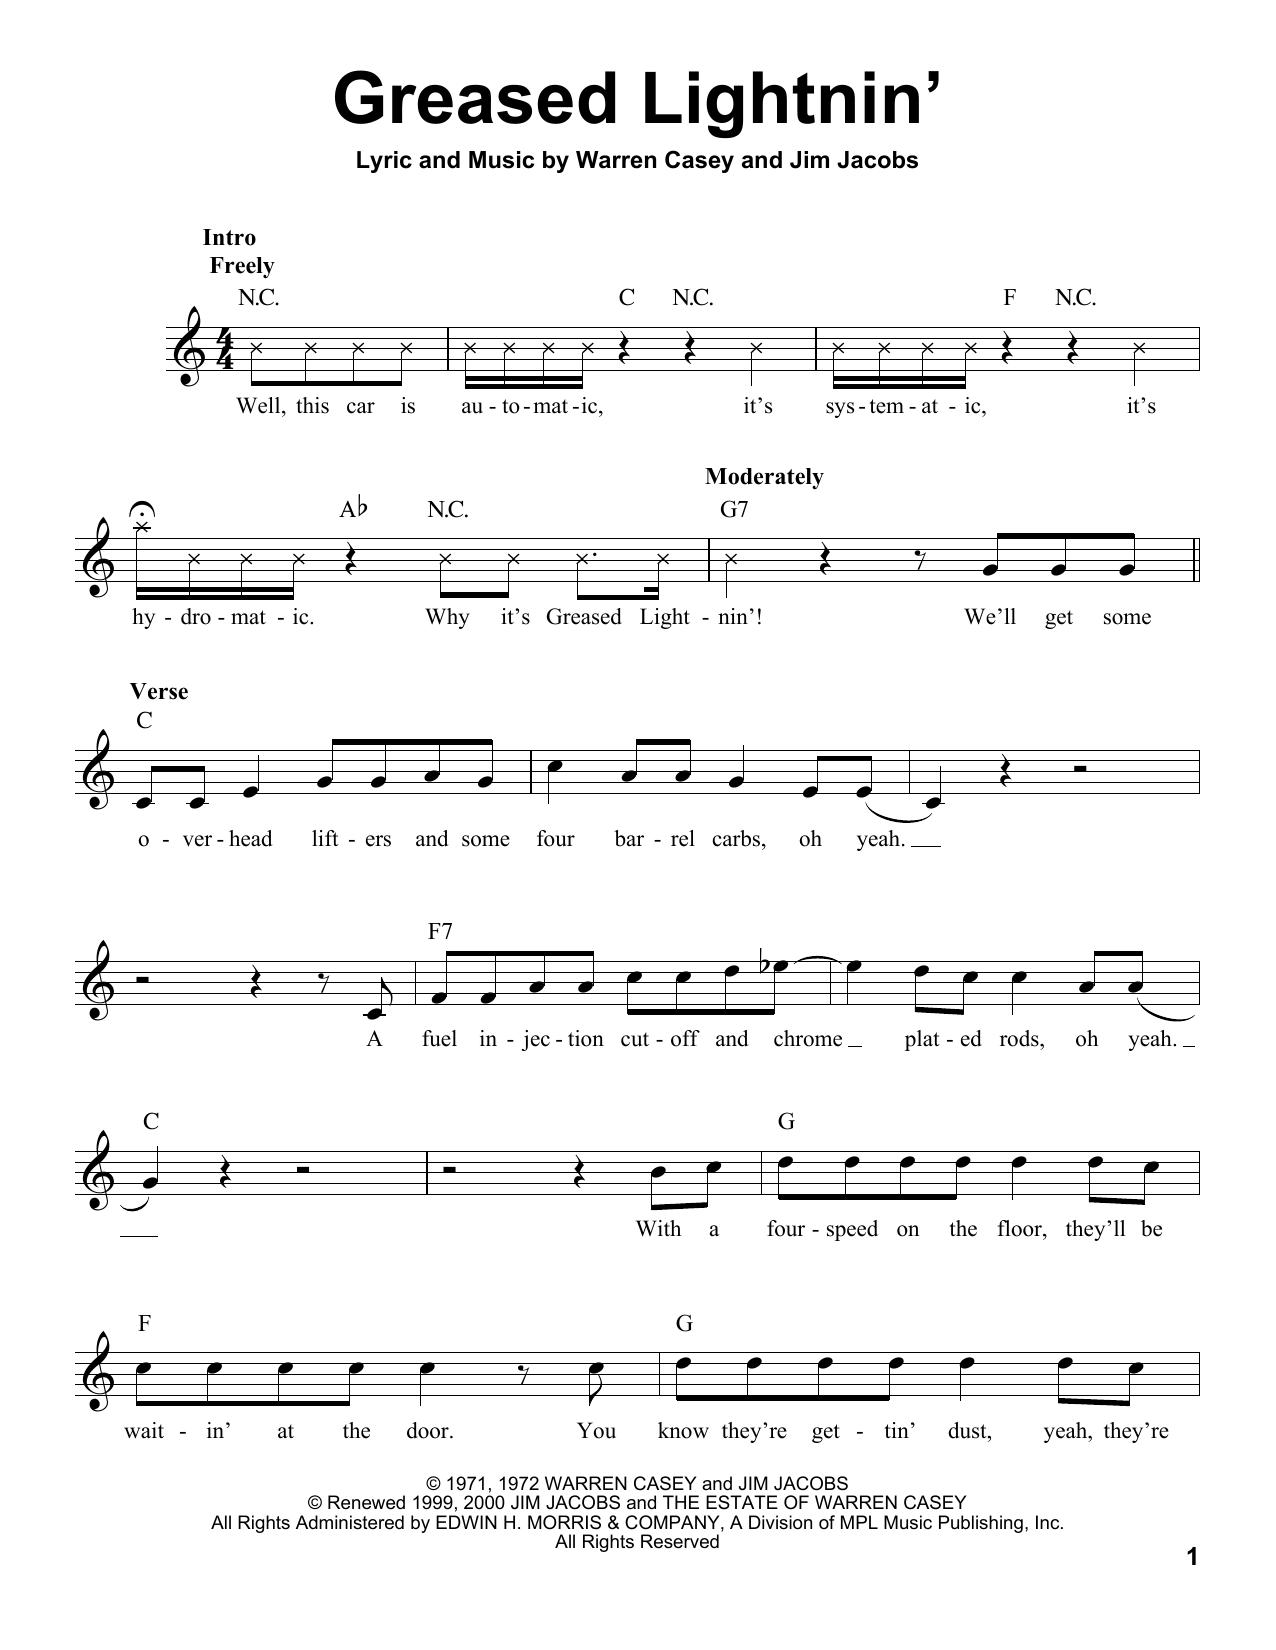 Sheet Music Digital Files To Print Licensed Jim Jacobs Digital